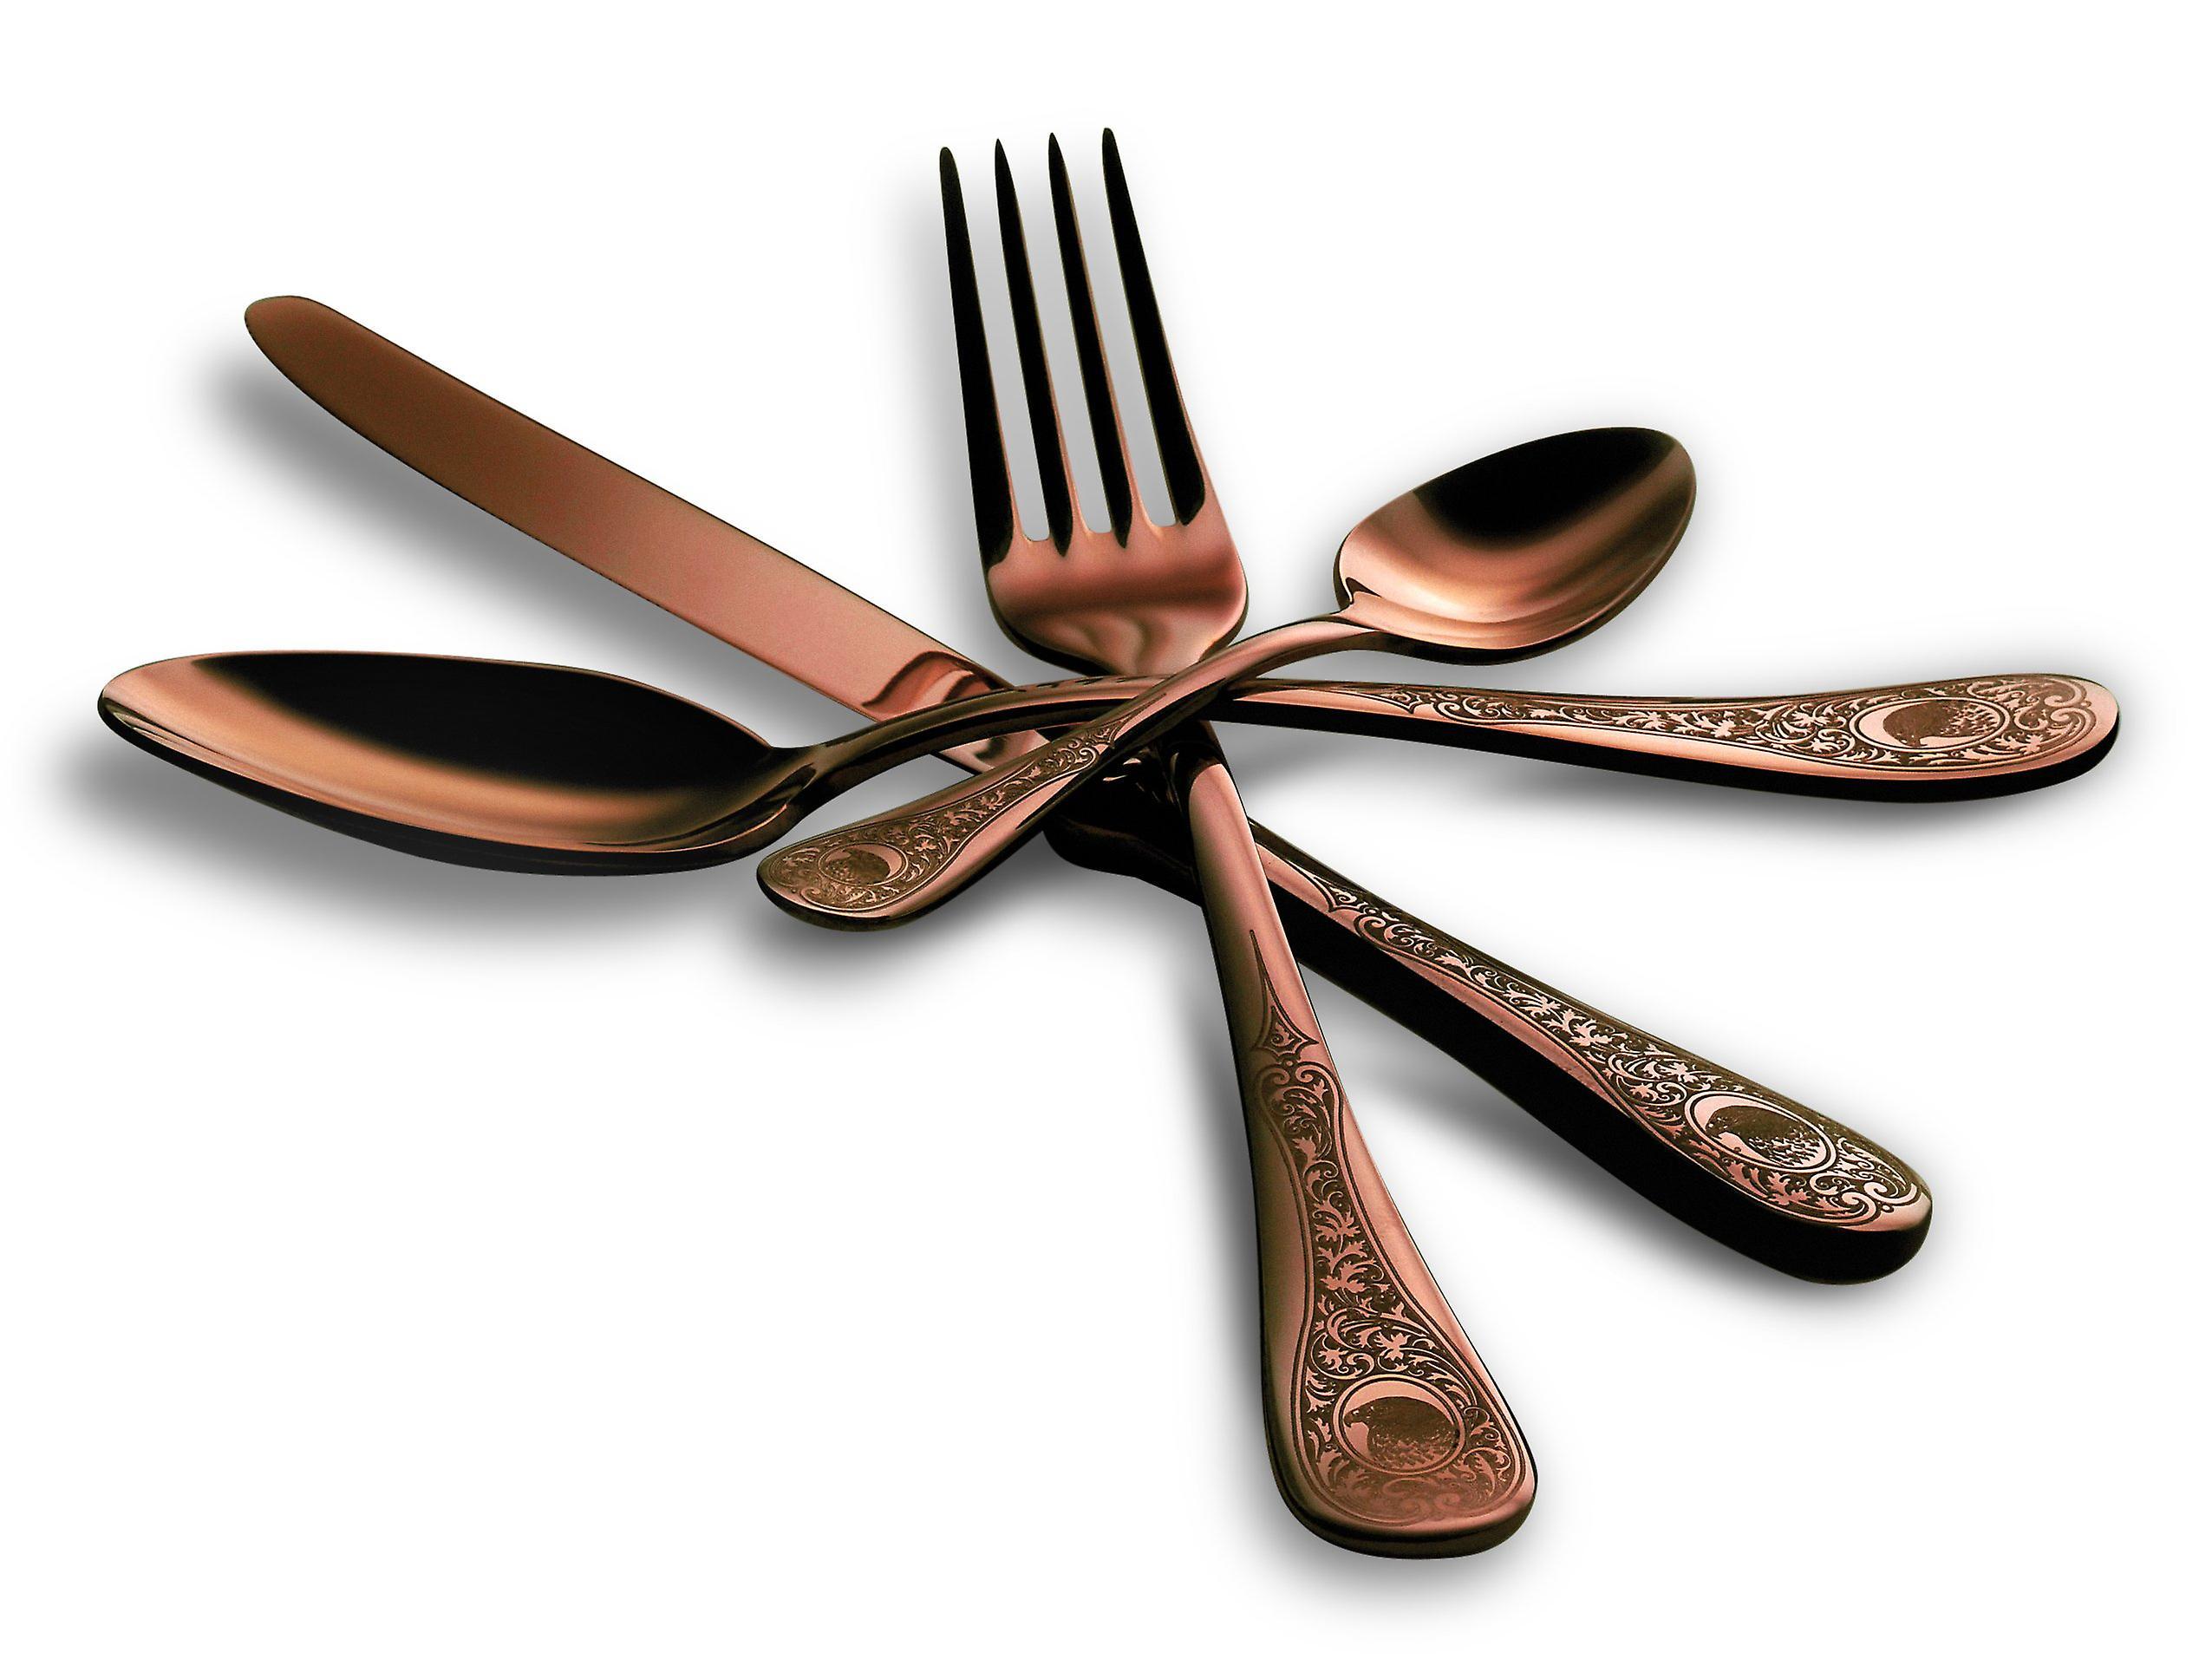 Mepra Diana Bronzo 24 pcs flatware set